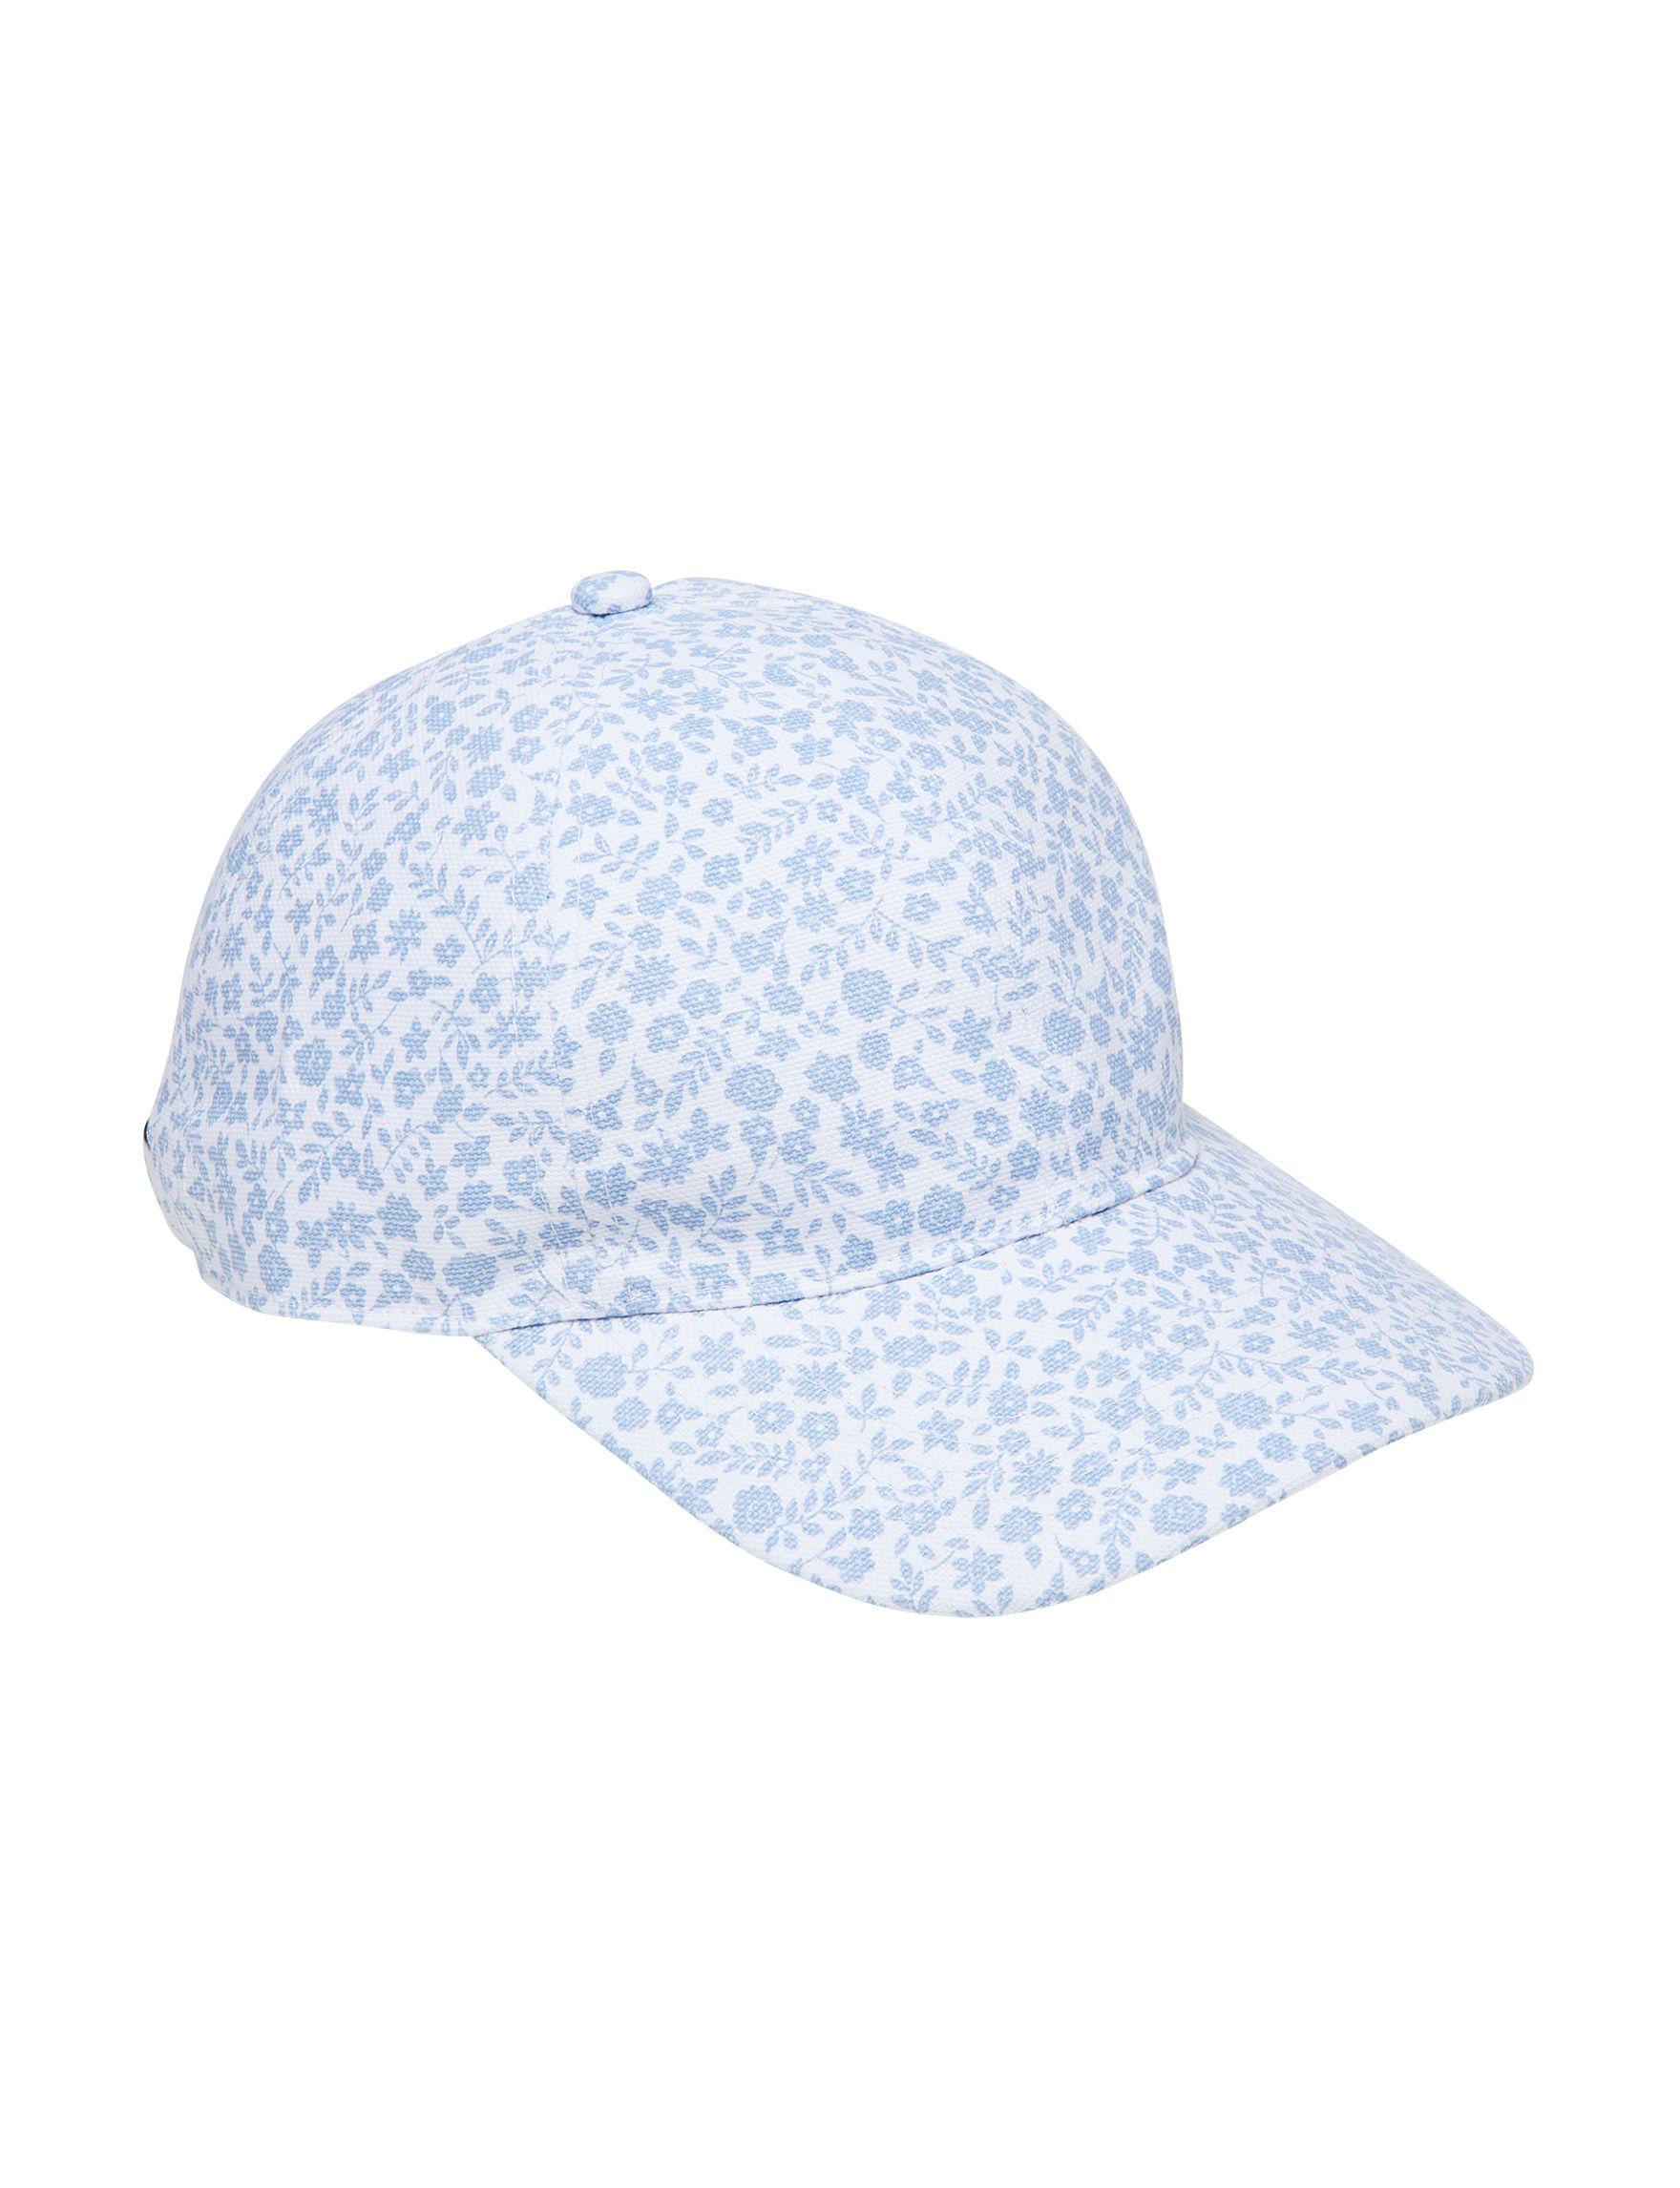 Chaps White / Blue Hats & Headwear